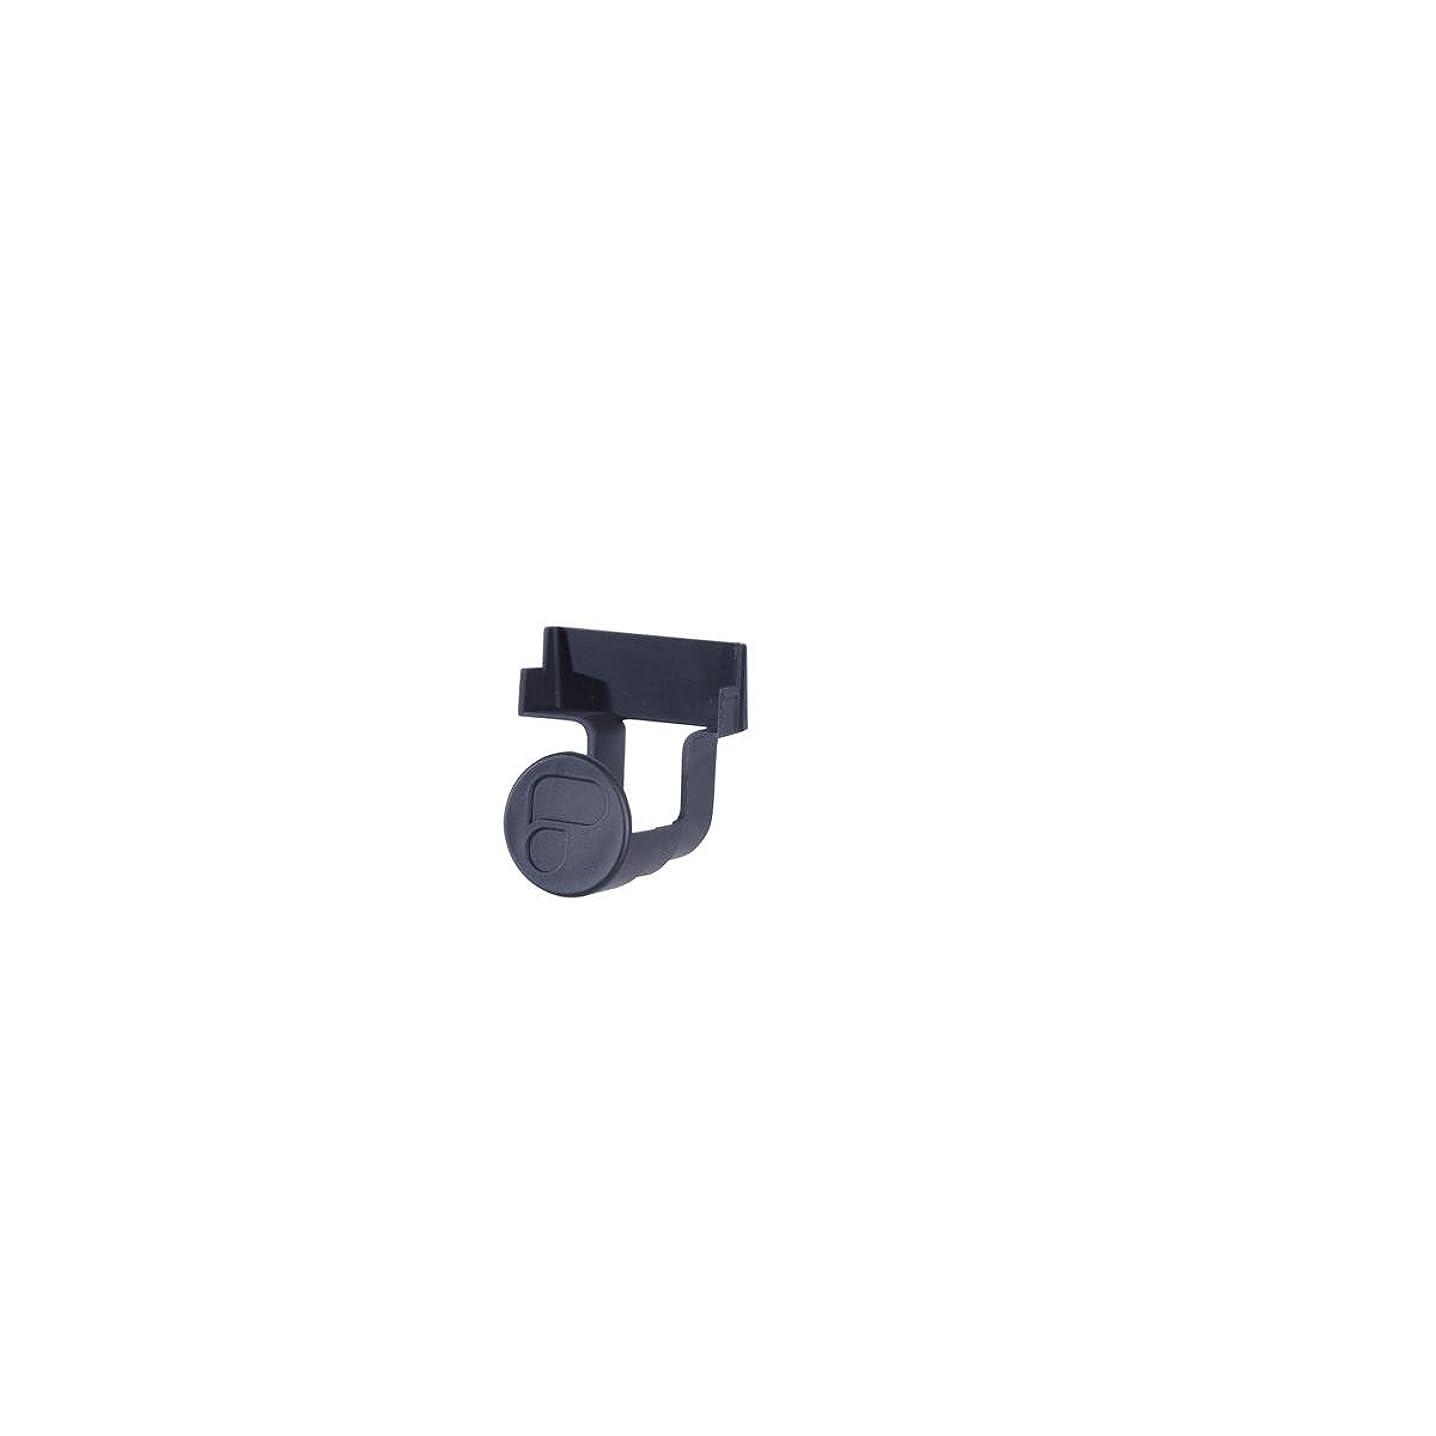 PolarPro Gimbal Lock/Lens Cover - for DJI Mavic Platinum and Mavic Pro